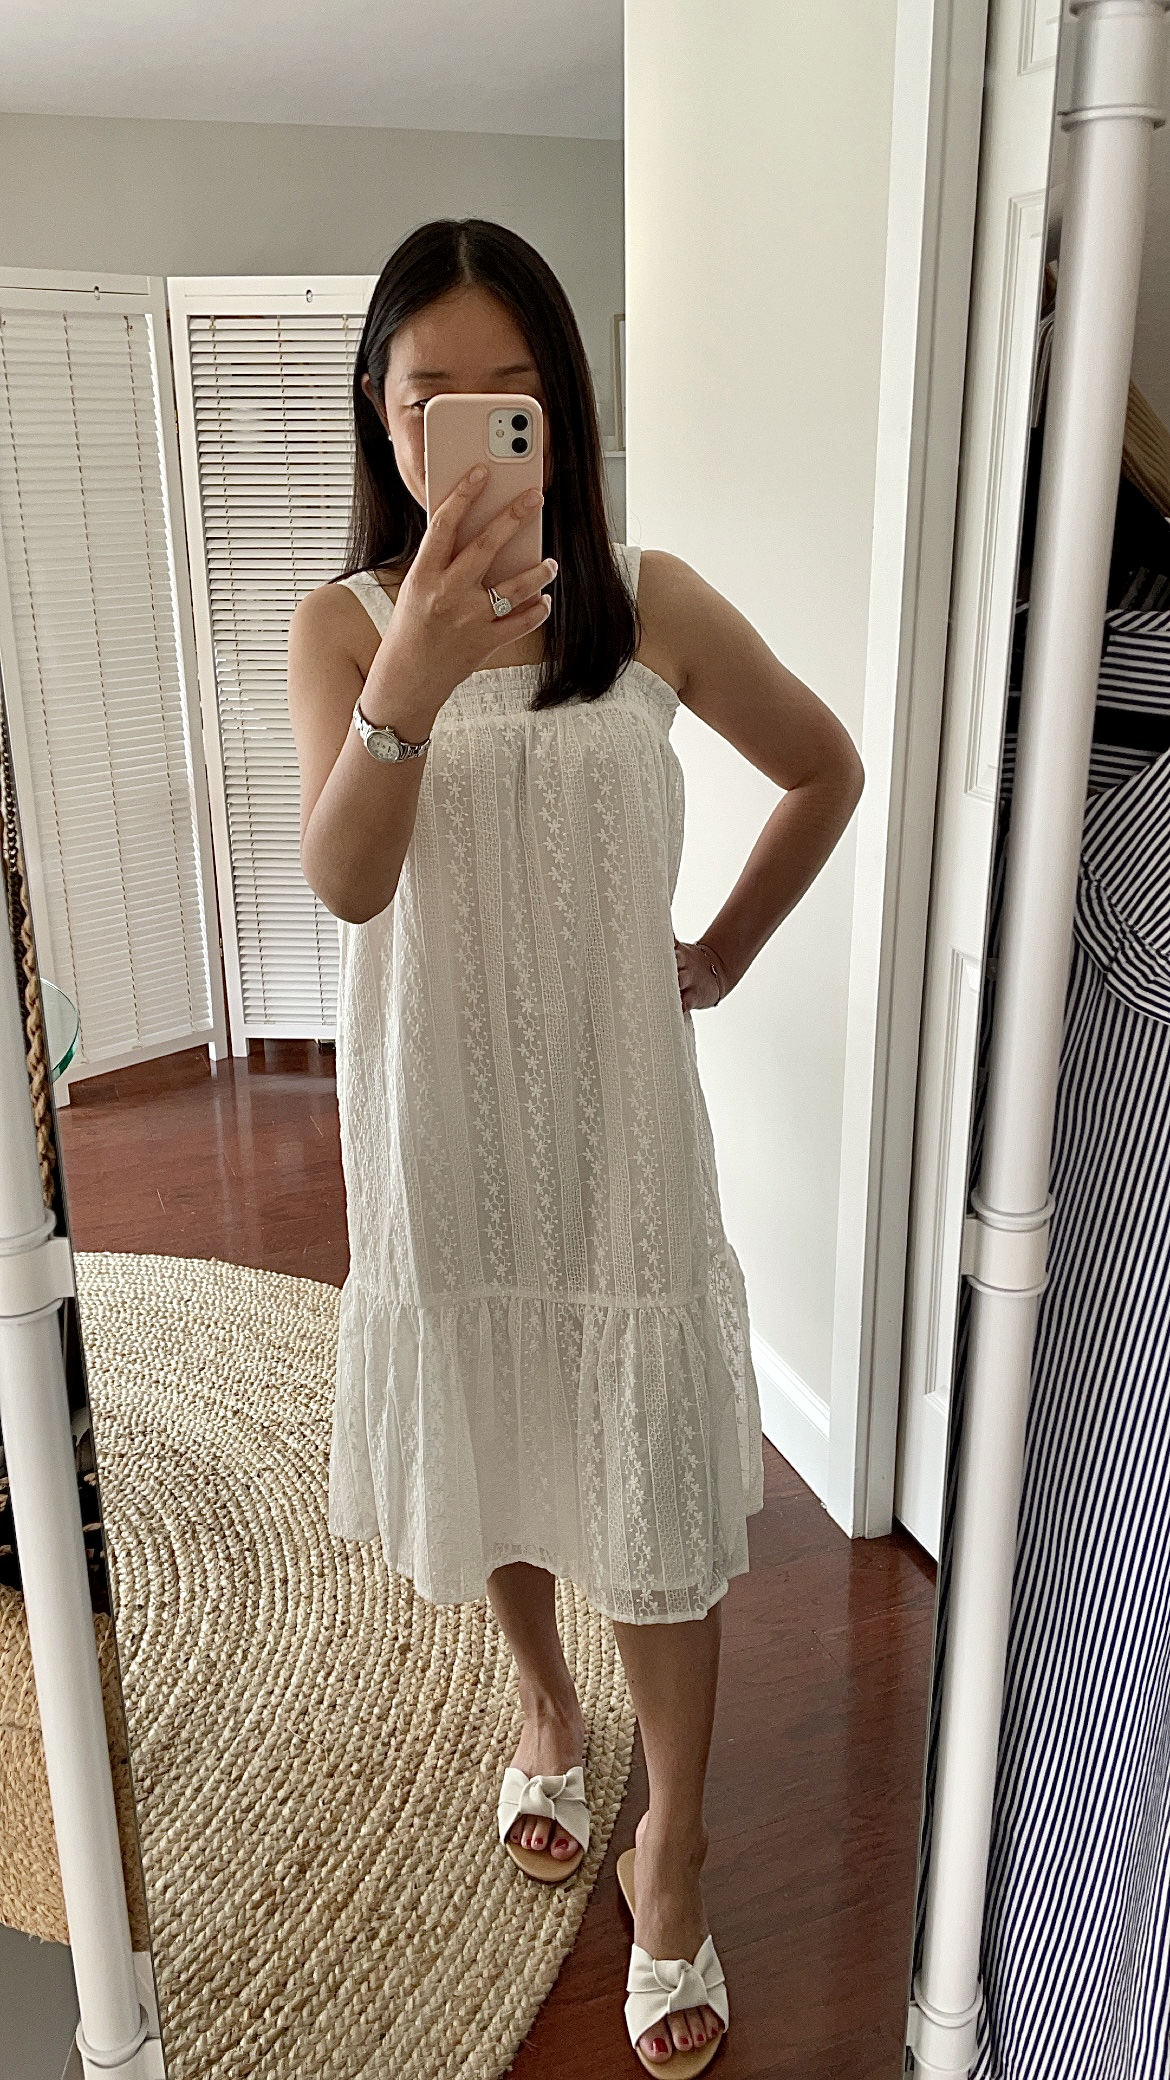 LOFT Smocked Square Neck Midi Dress, size XSP